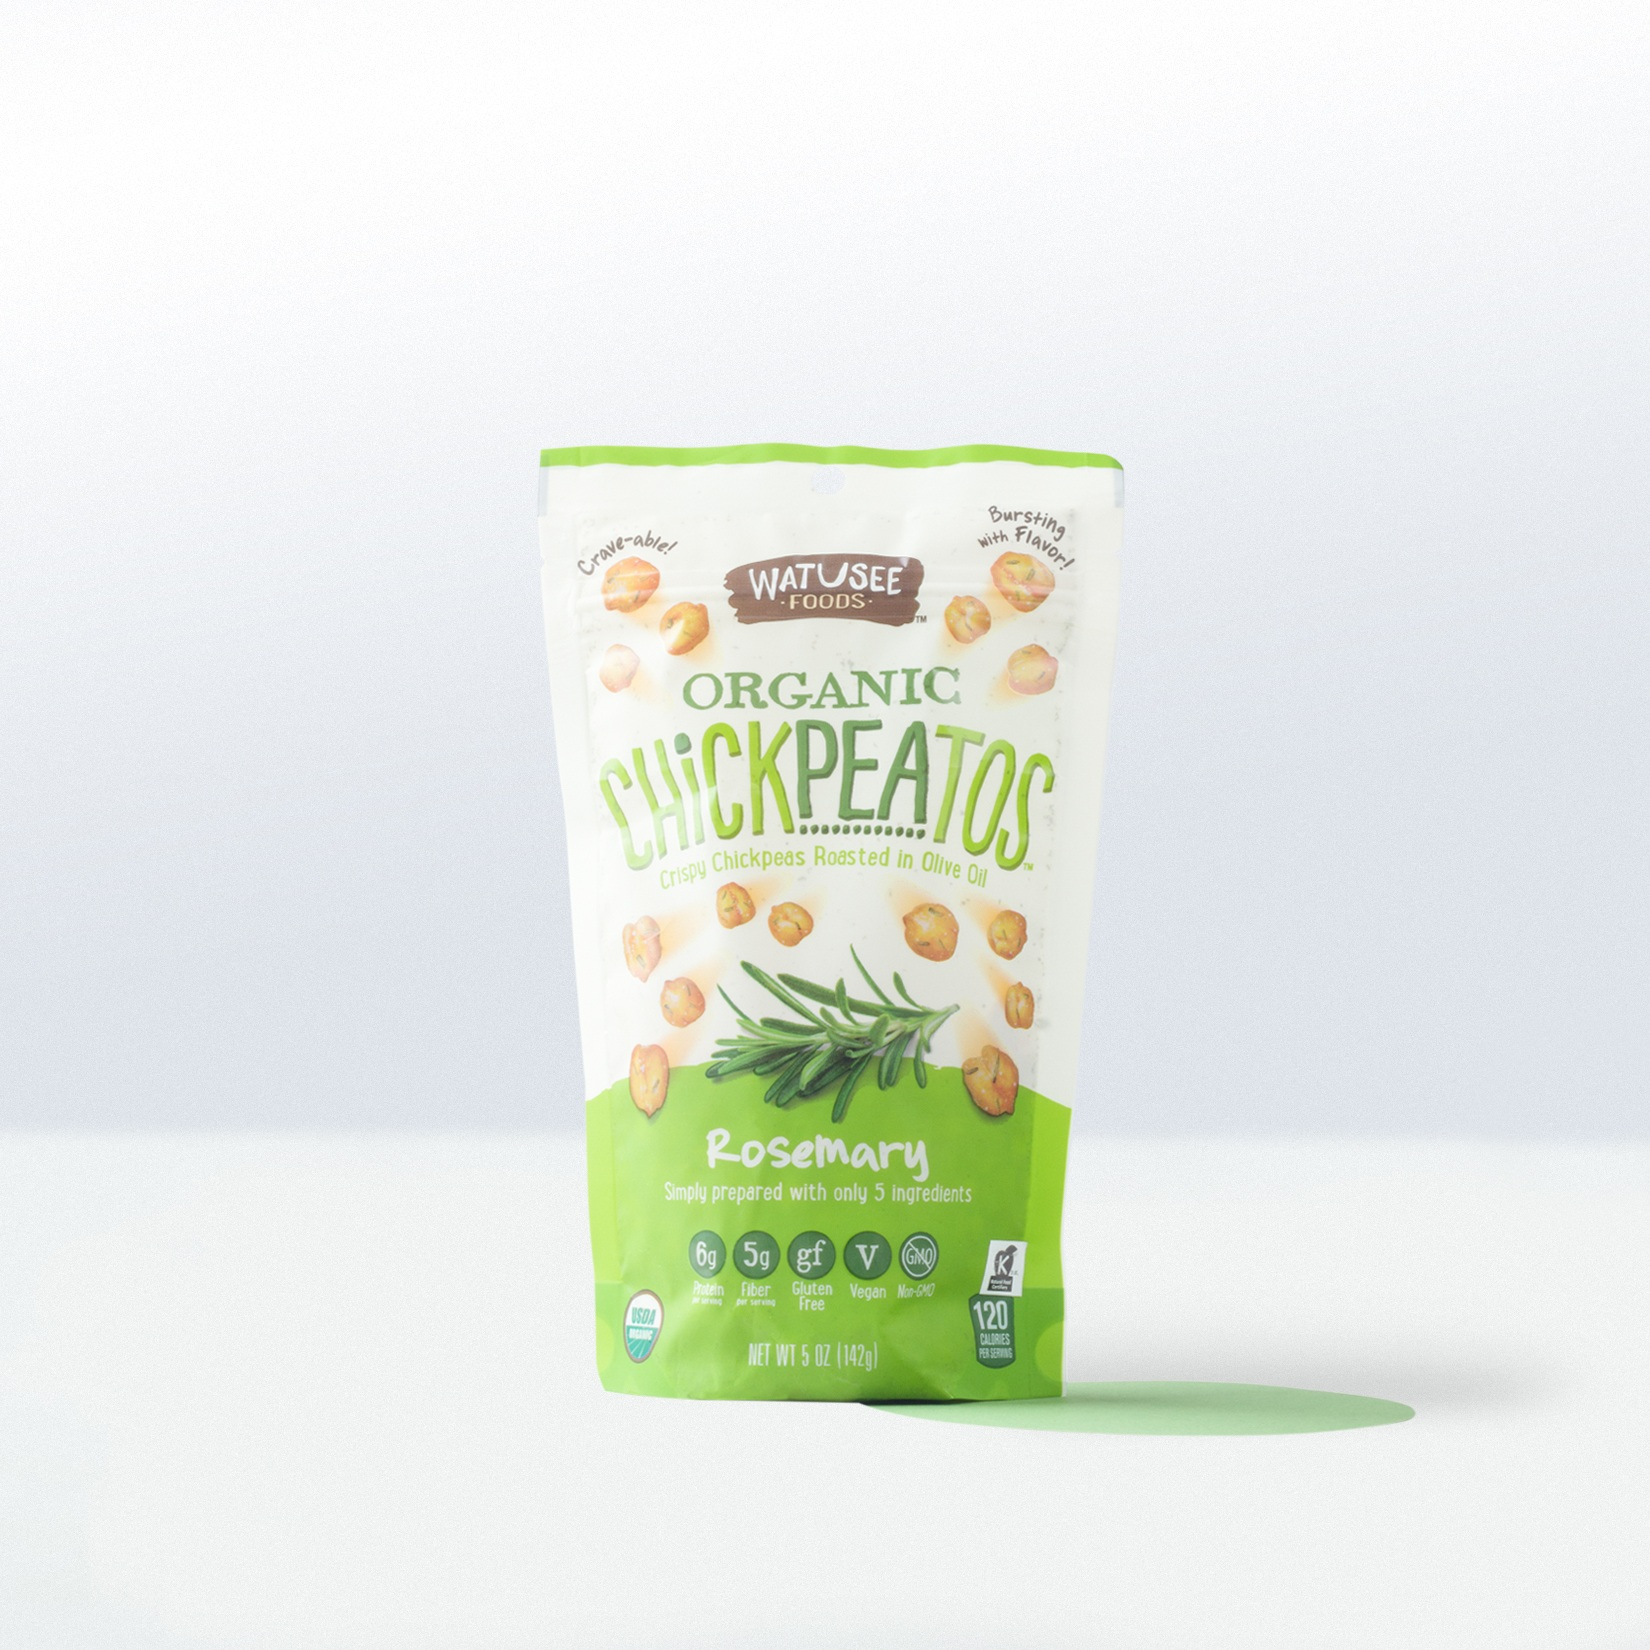 Watusee Foods-Organic Chickpeatos Rosemary